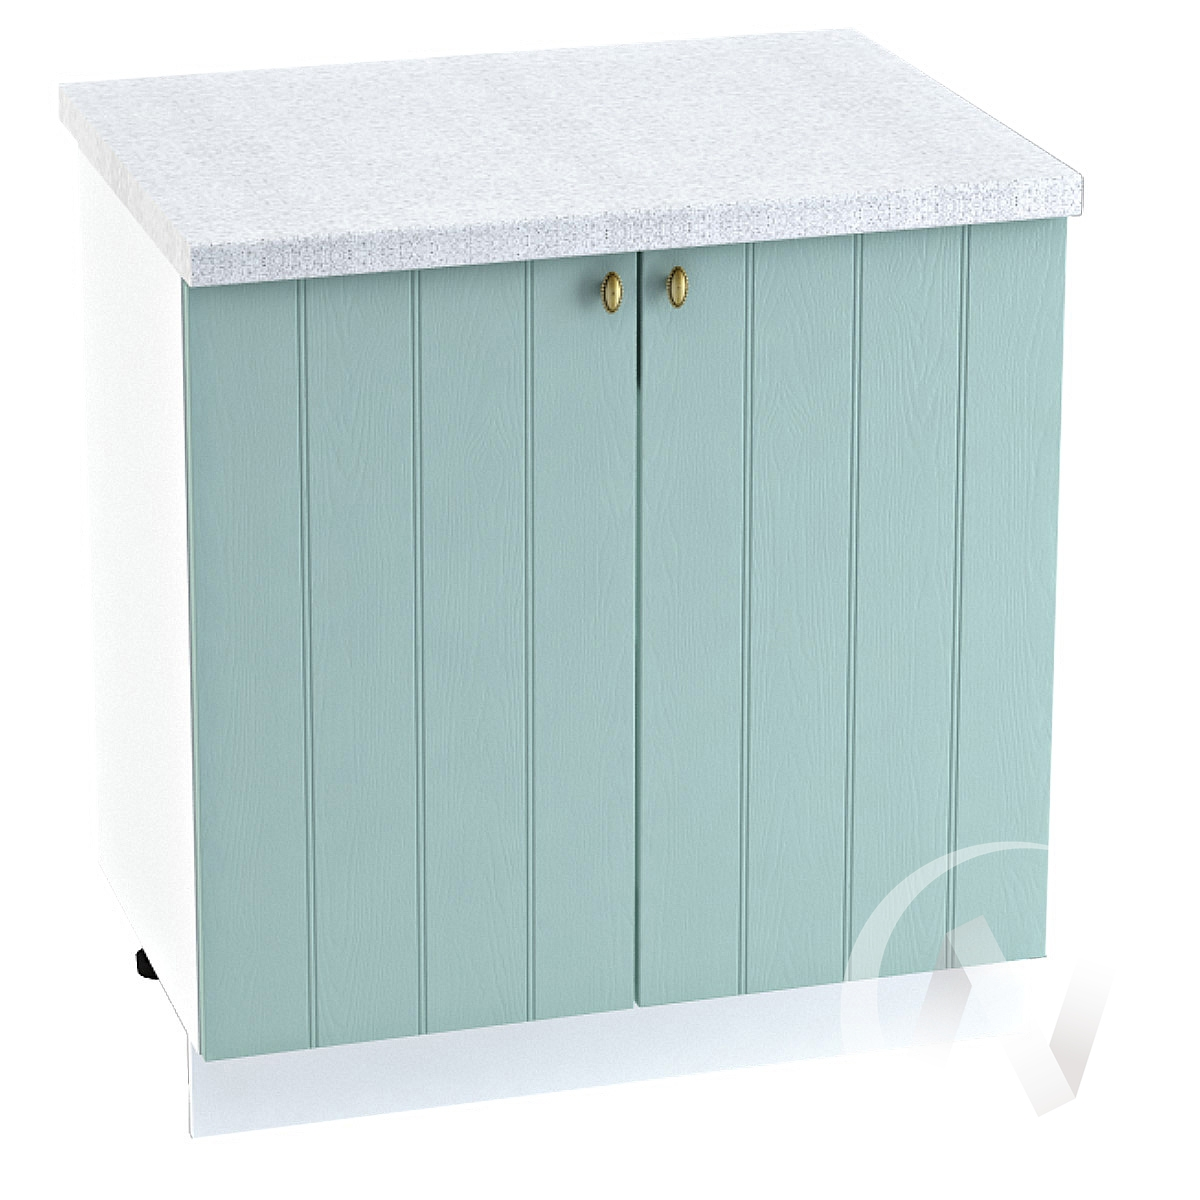 "Кухня ""Прованс"": Шкаф нижний 800, ШН 800 (голубой/корпус белый)"